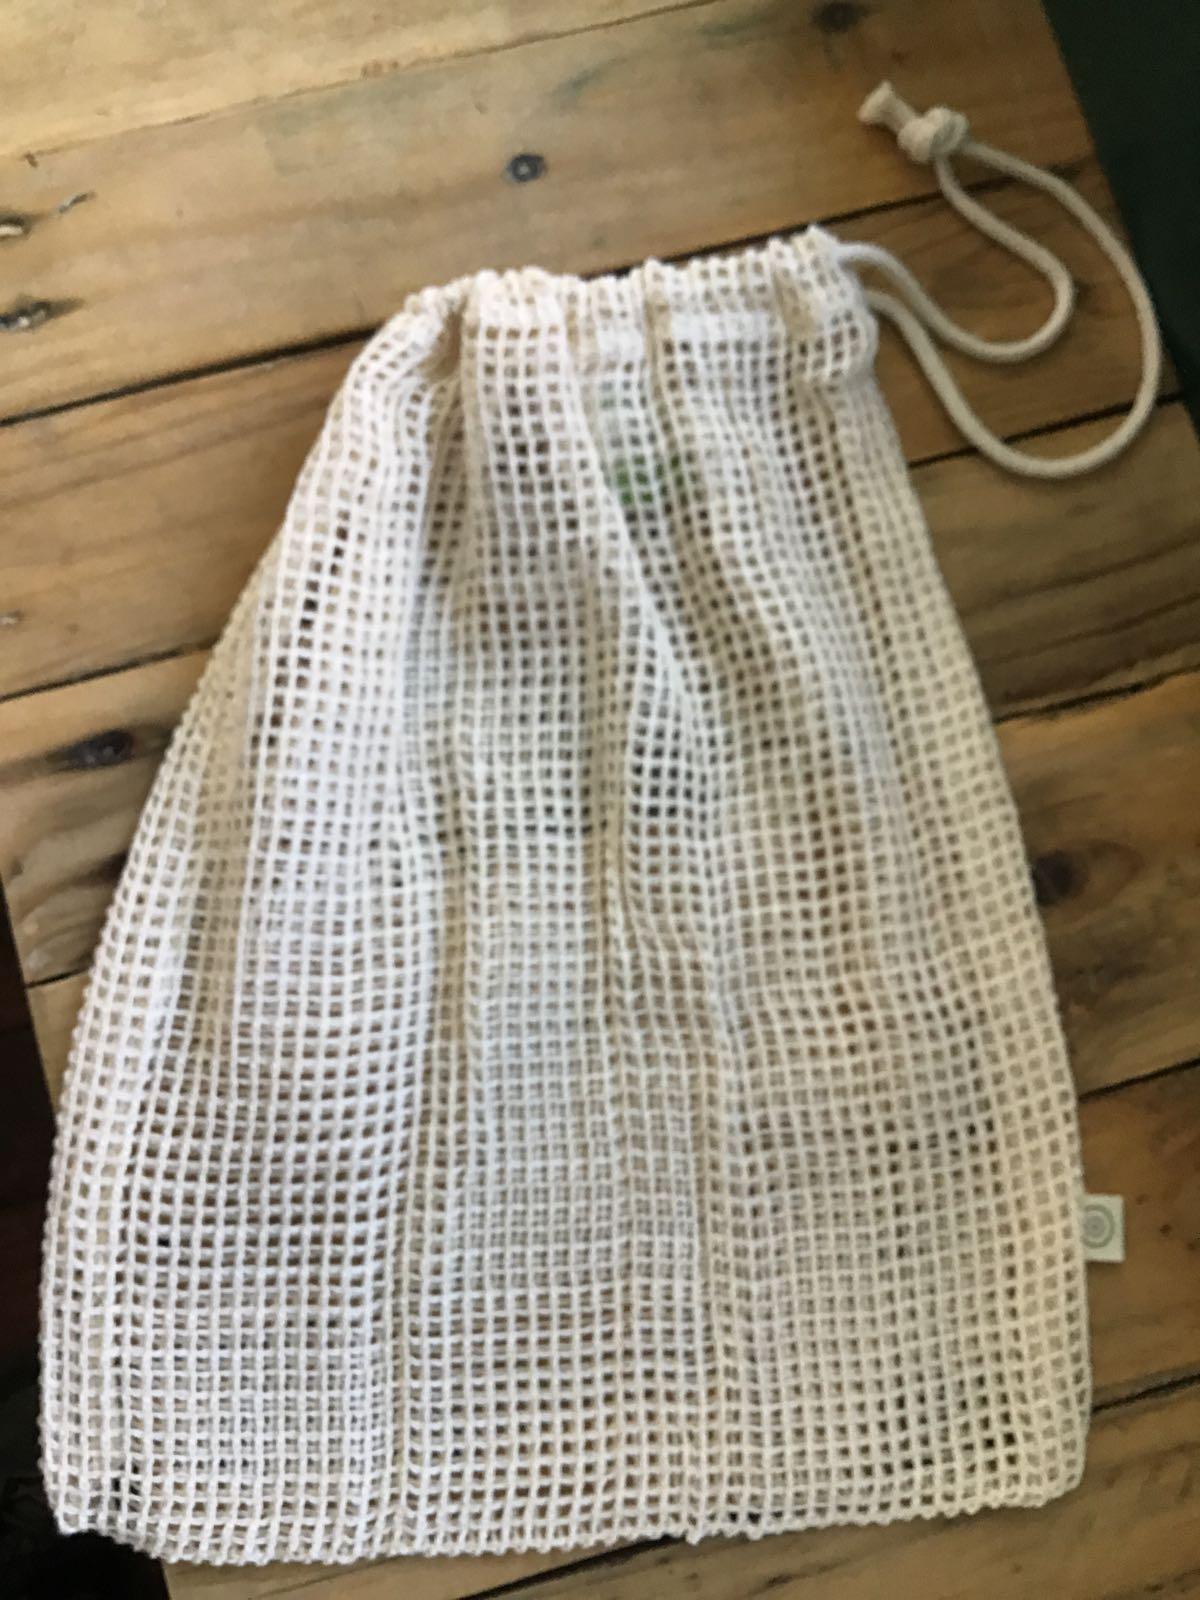 Medium, Mesh Cotton produce bags (Organic)